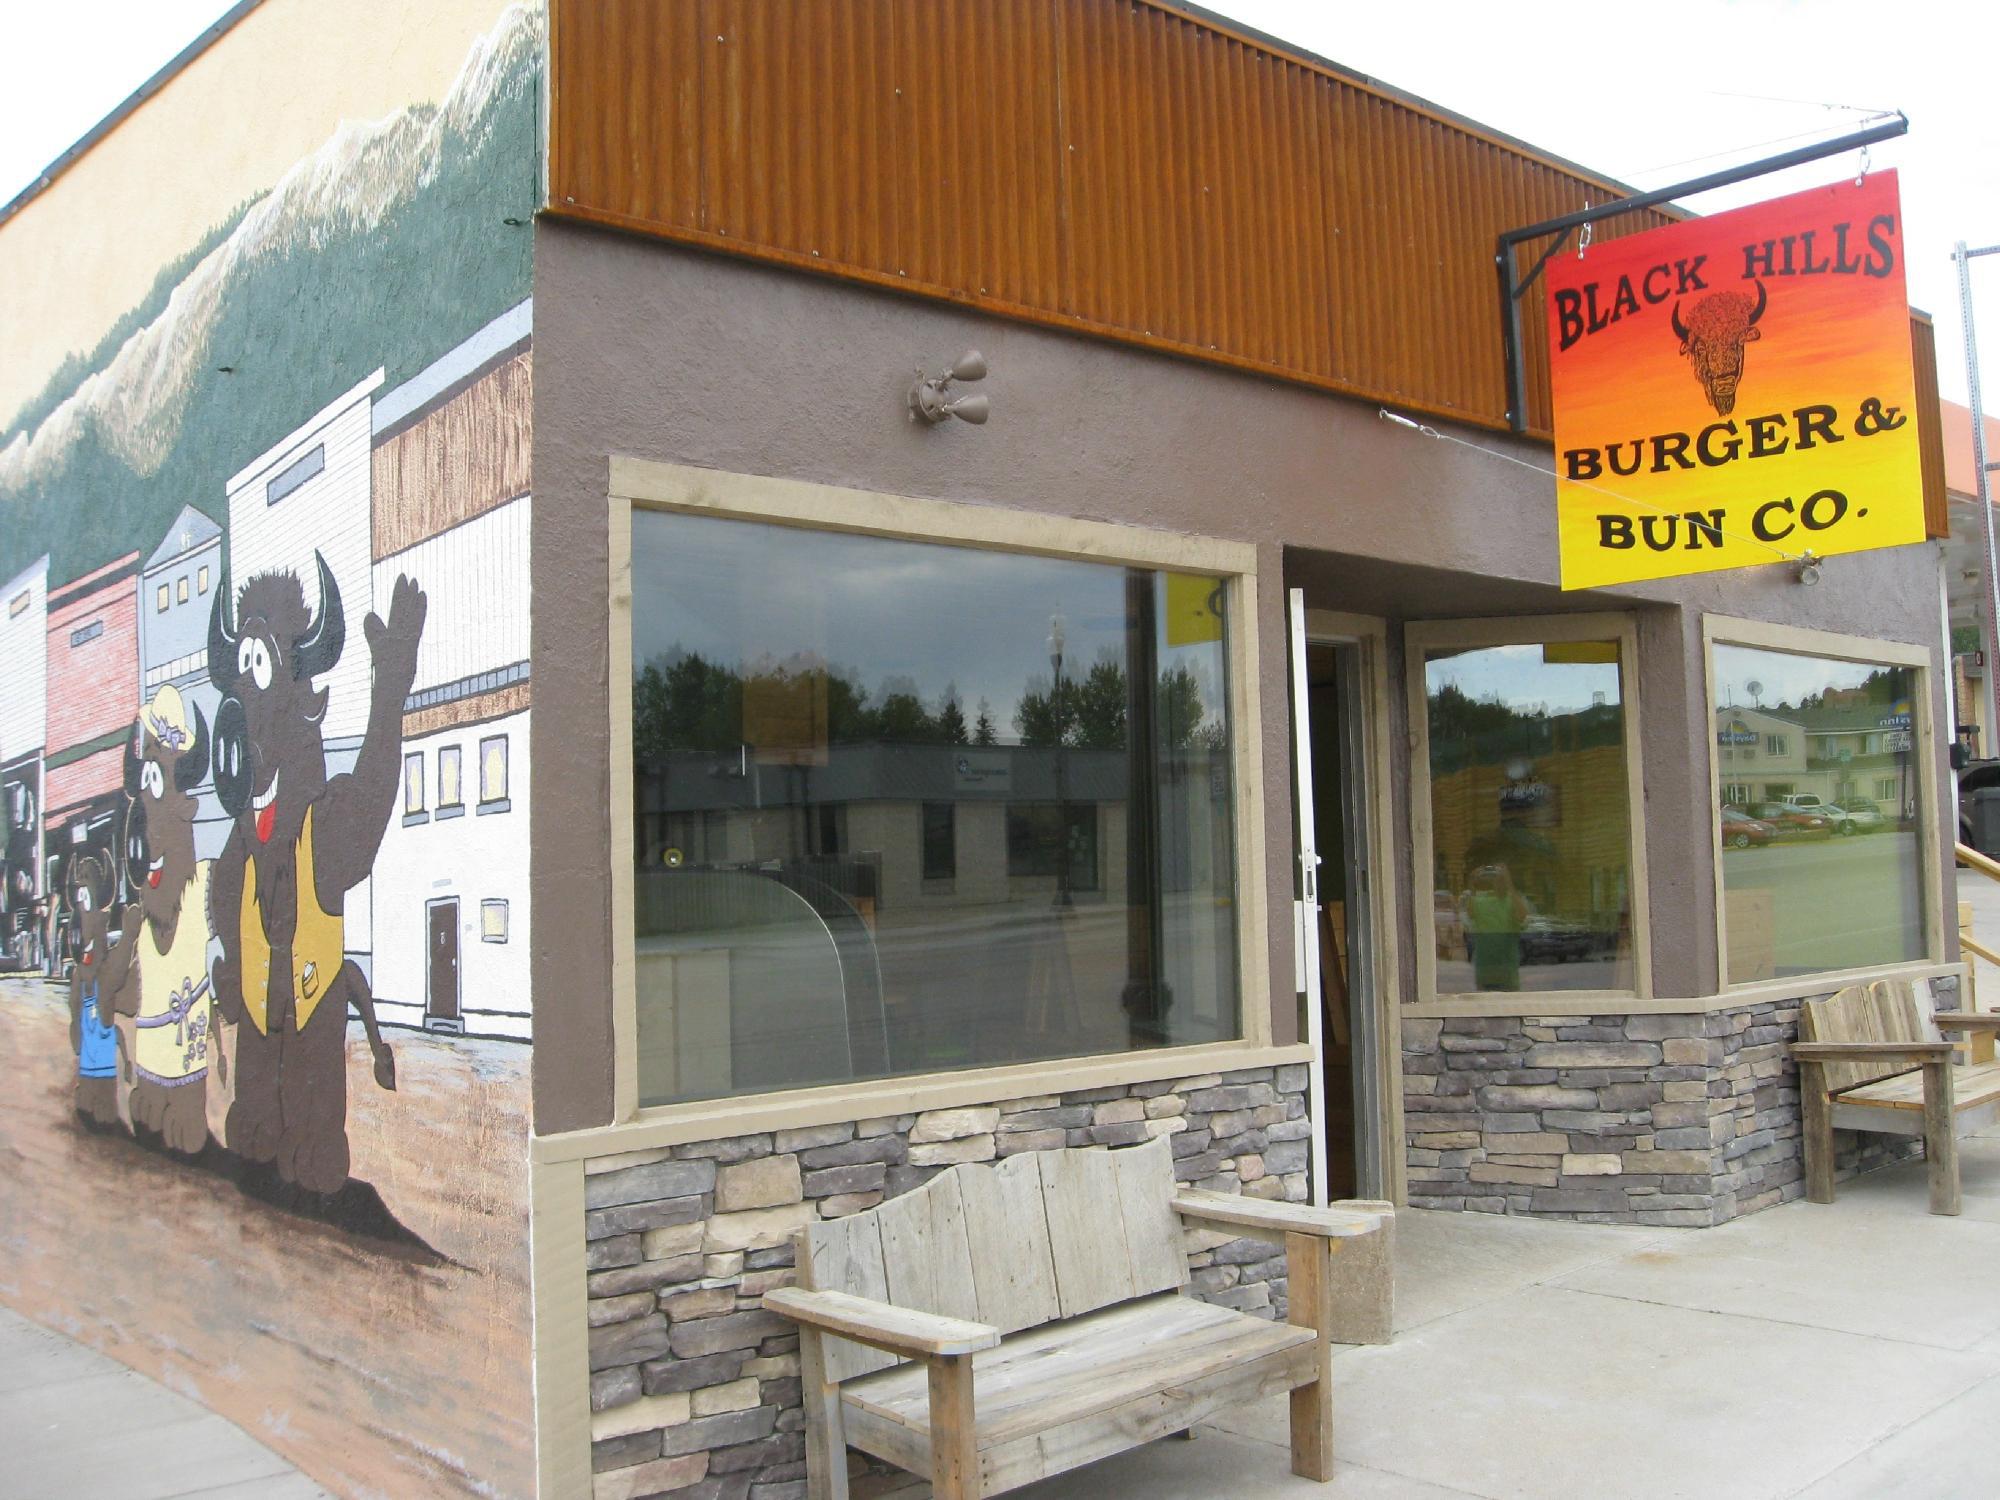 Black Hills Burger and Bun Co. in Custer, SD serves up the best burger in the U.S., according to TripAdvisor reviewers. (A TripAdvisor traveler photo)